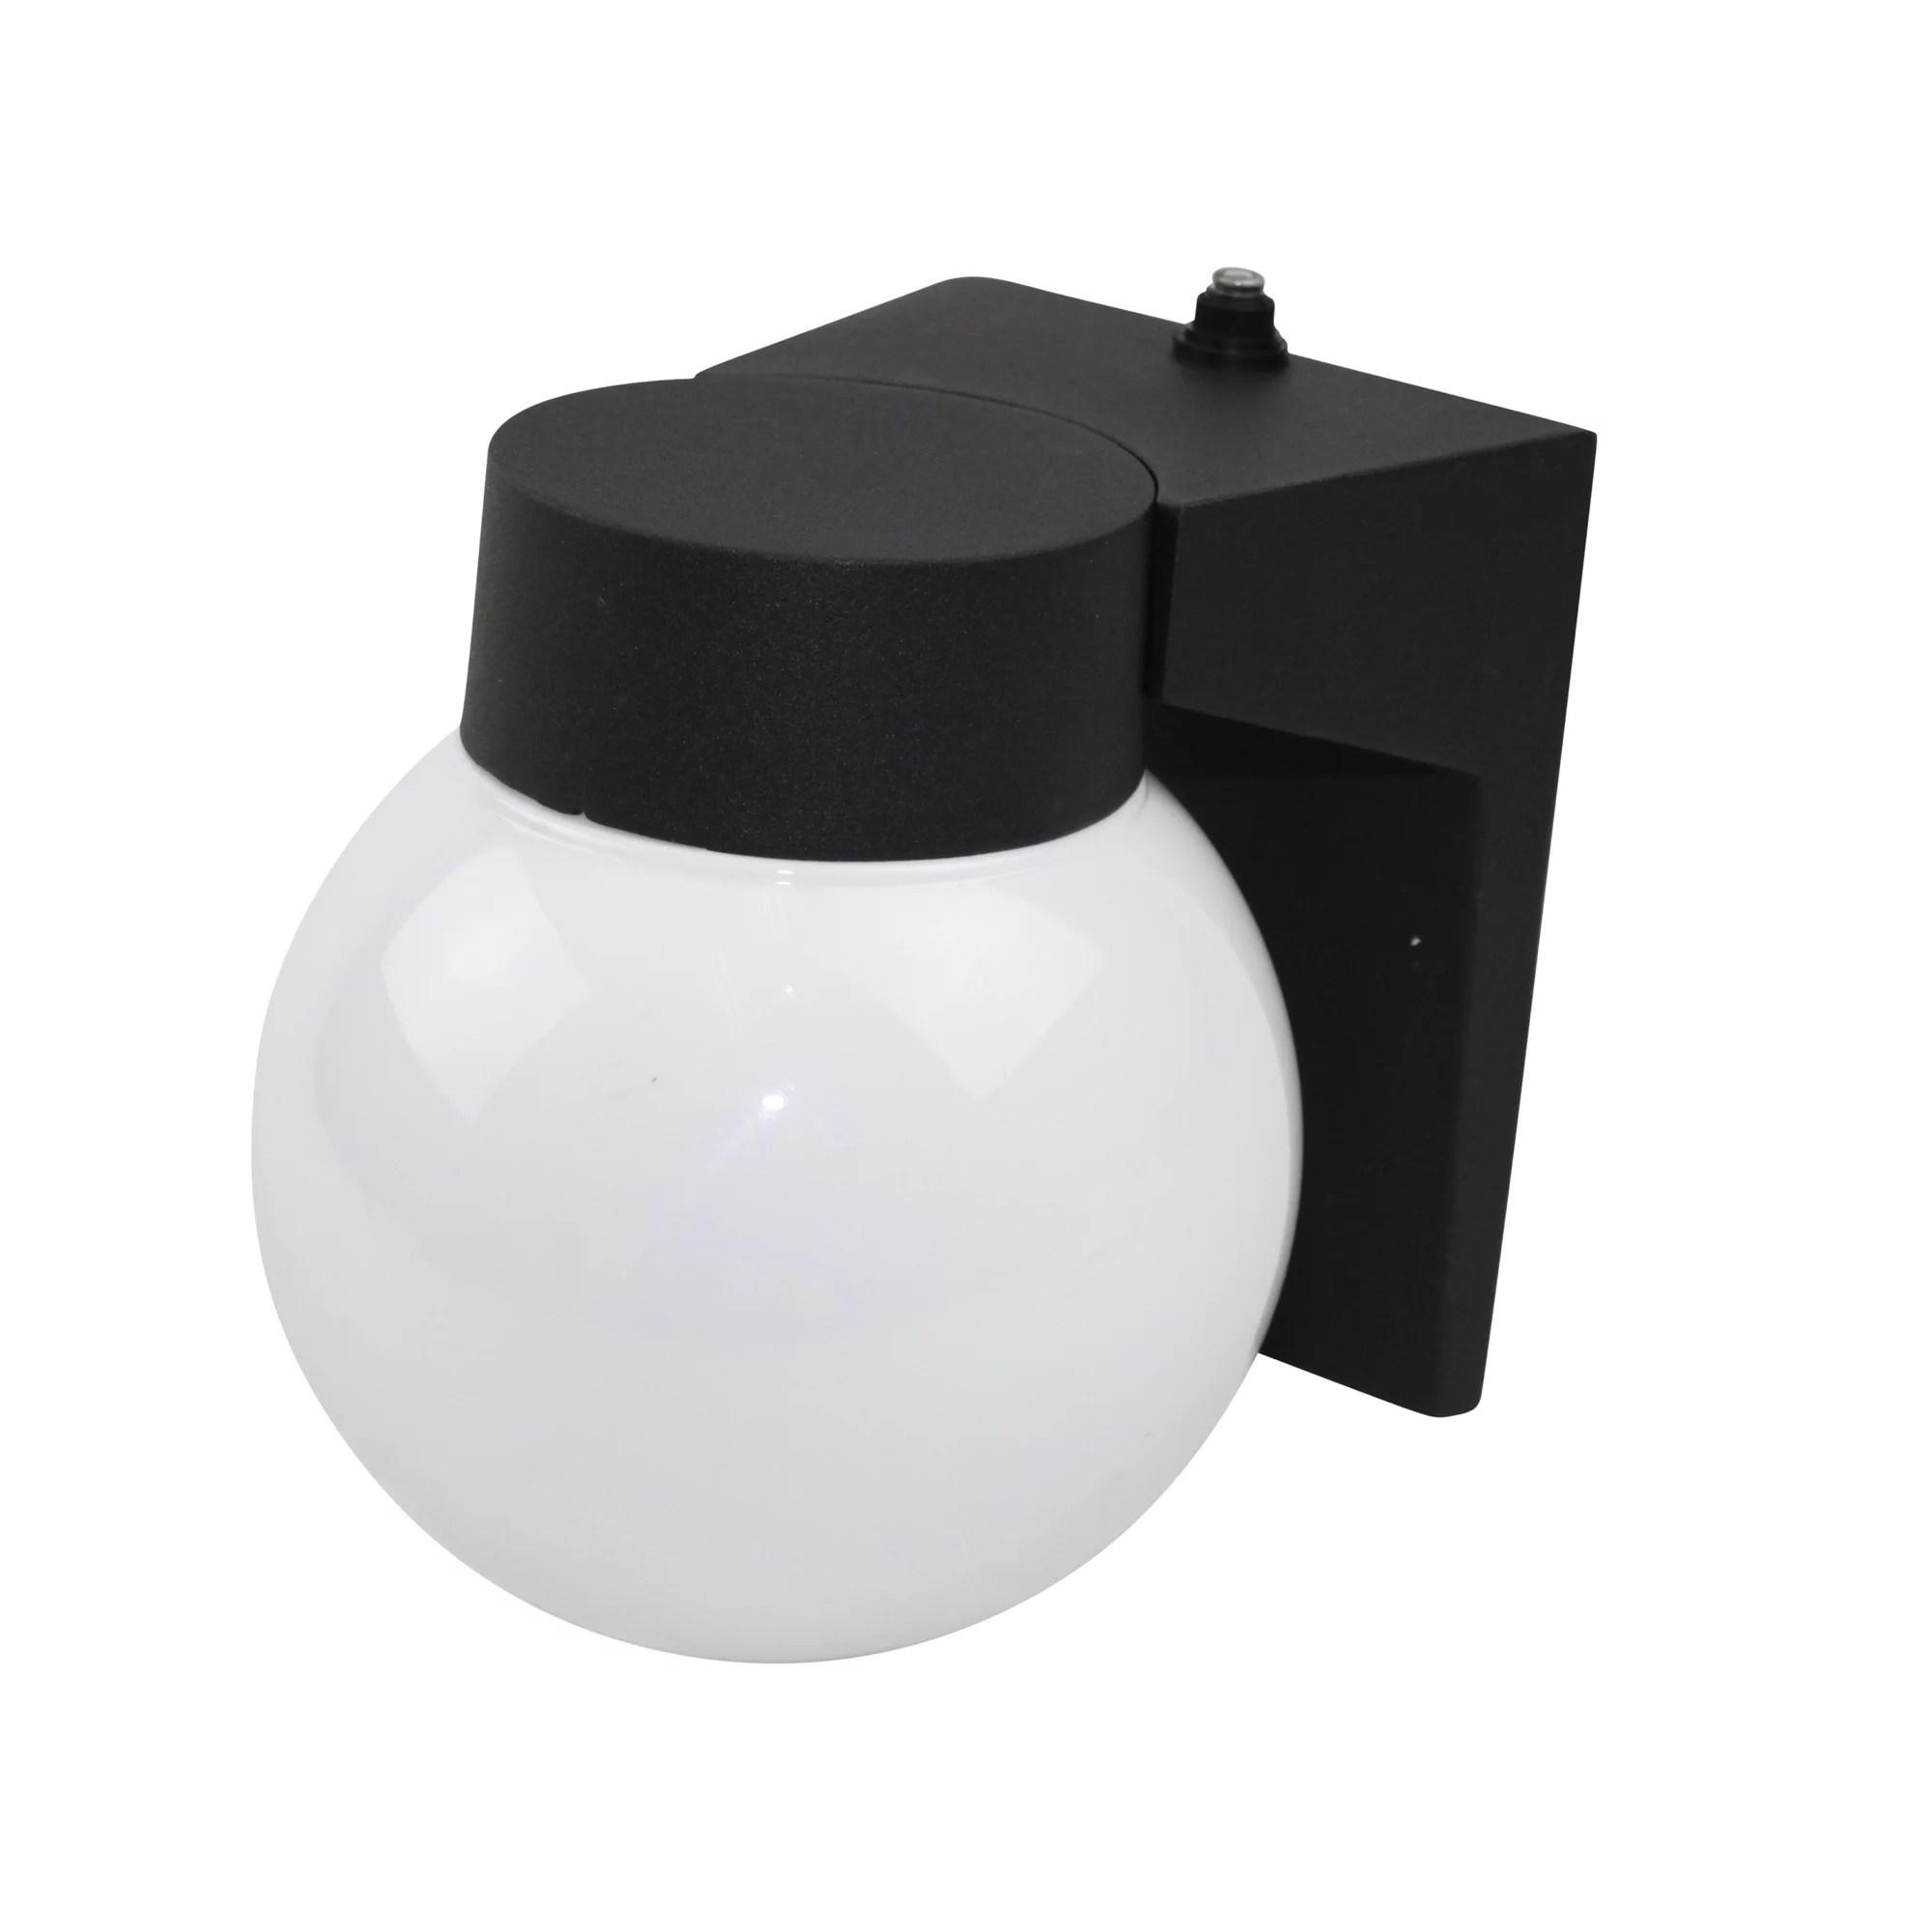 maxlite buffalo globe lantern outdoor lamp 8223 dusk to dawn photocell energy saving light black